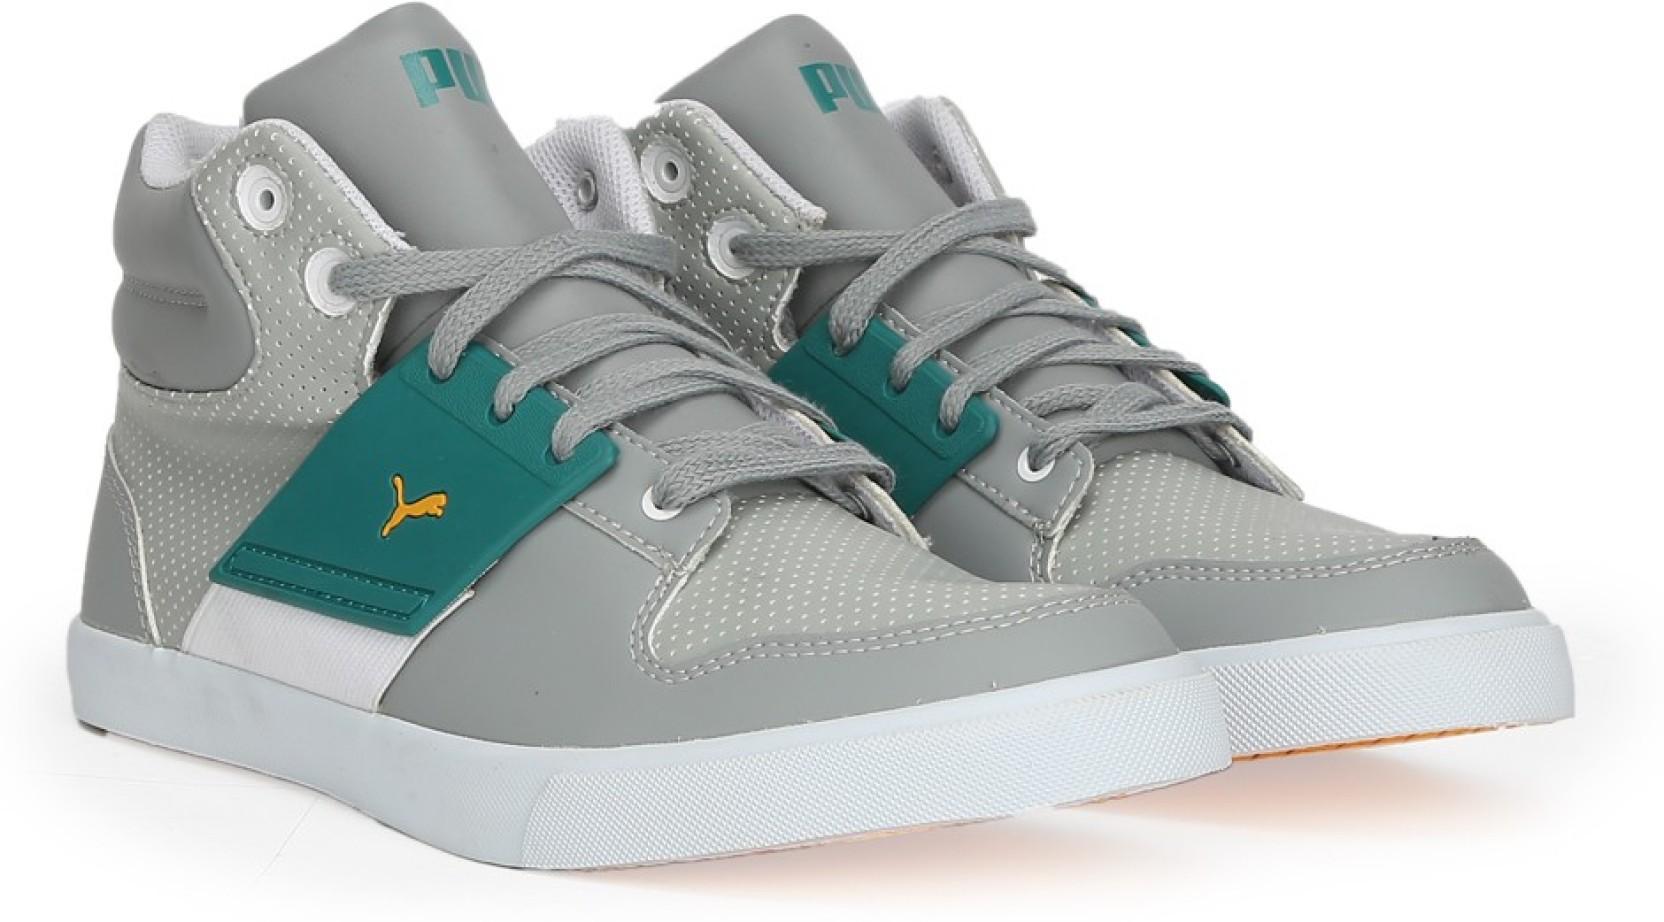 be371be4ddb141 Puma El Ace 2 PN II DP Mid Ankle Sneakers For Men - Buy limestone ...